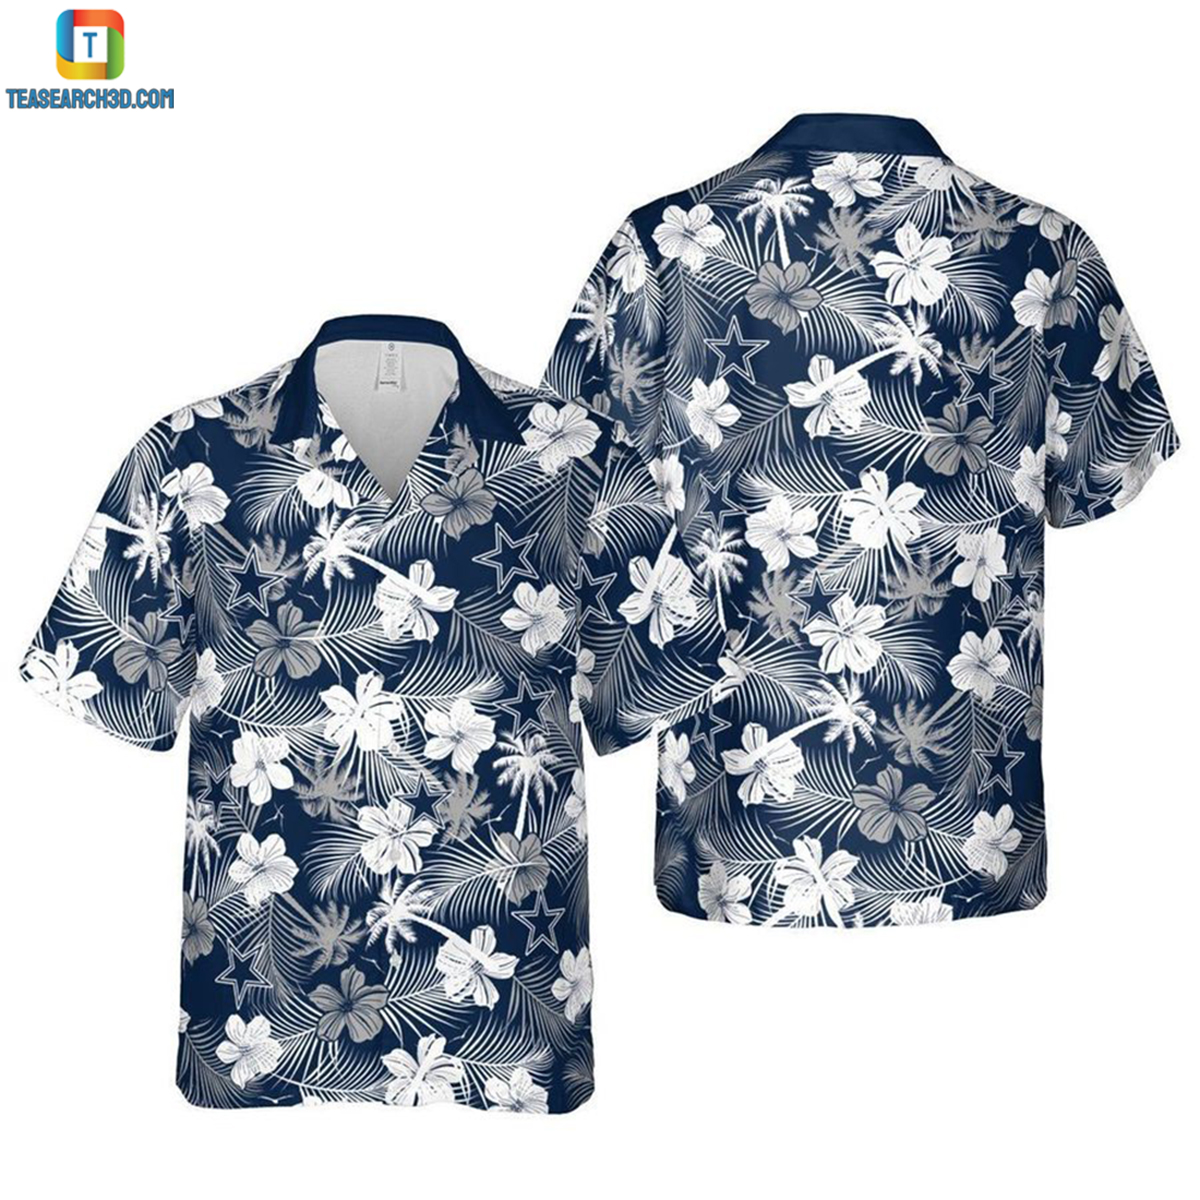 Dallas cowboys fort worth nfl football hawaiian shirt 2